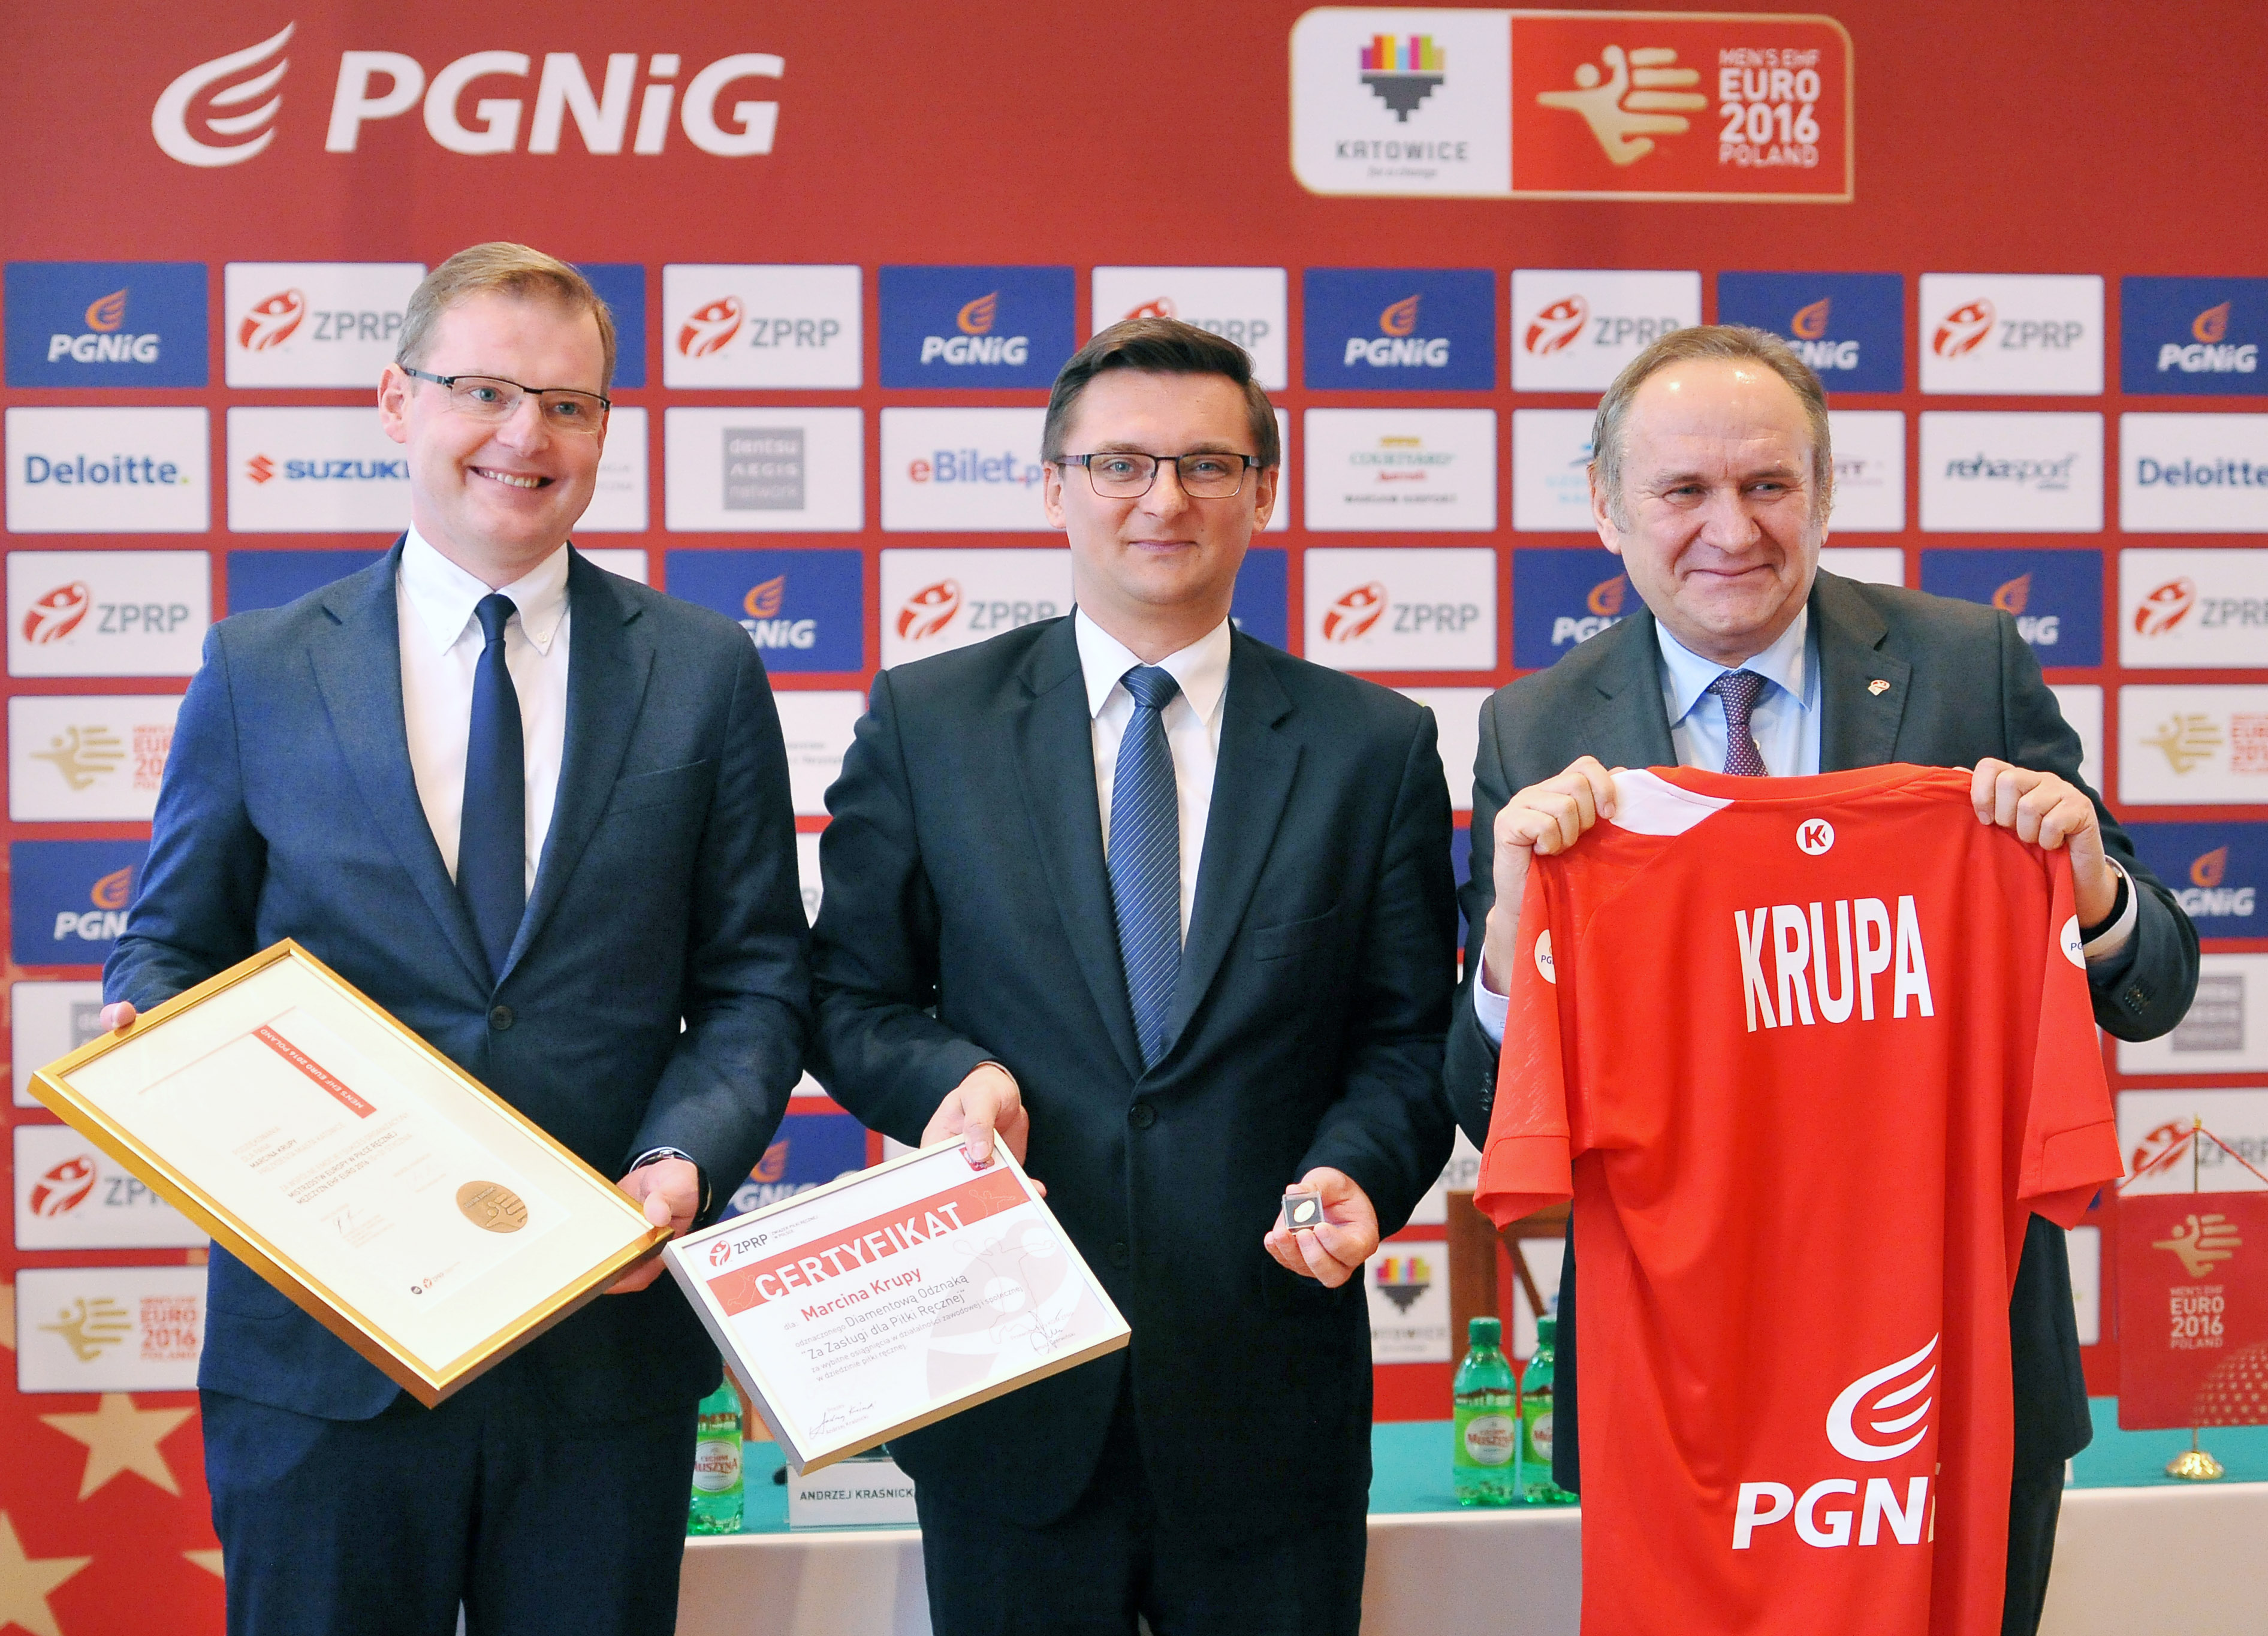 W Katowicach podsumowano EHF EURO 2016